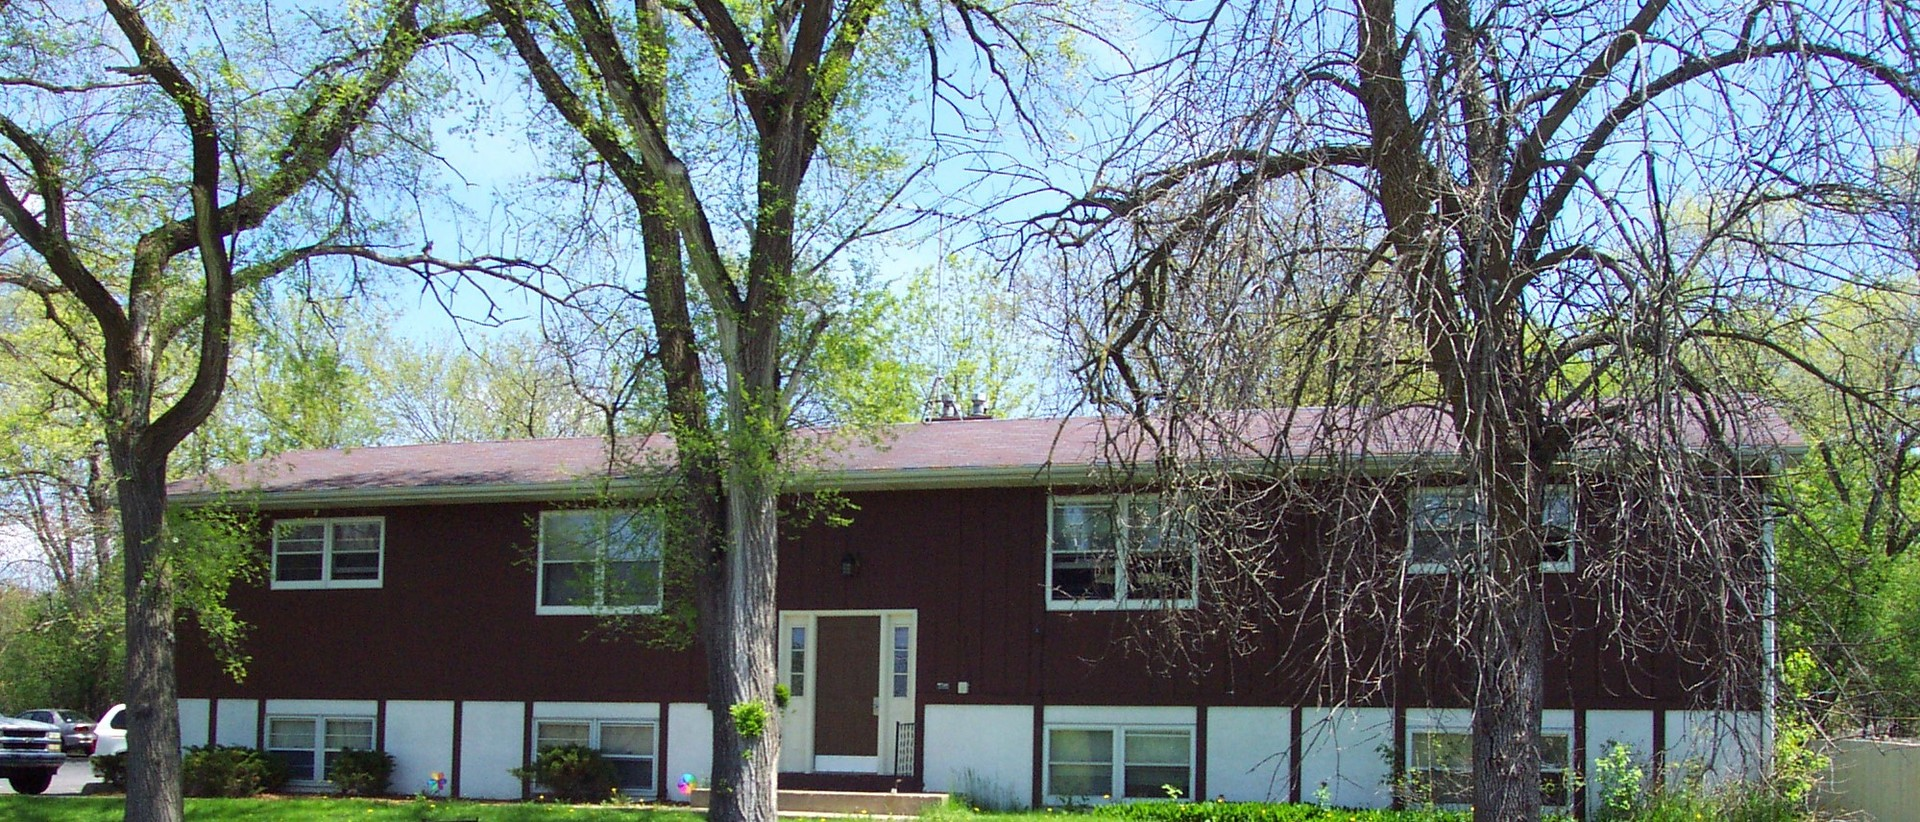 791 North Anita, ANTIOCH, Illinois, 60002